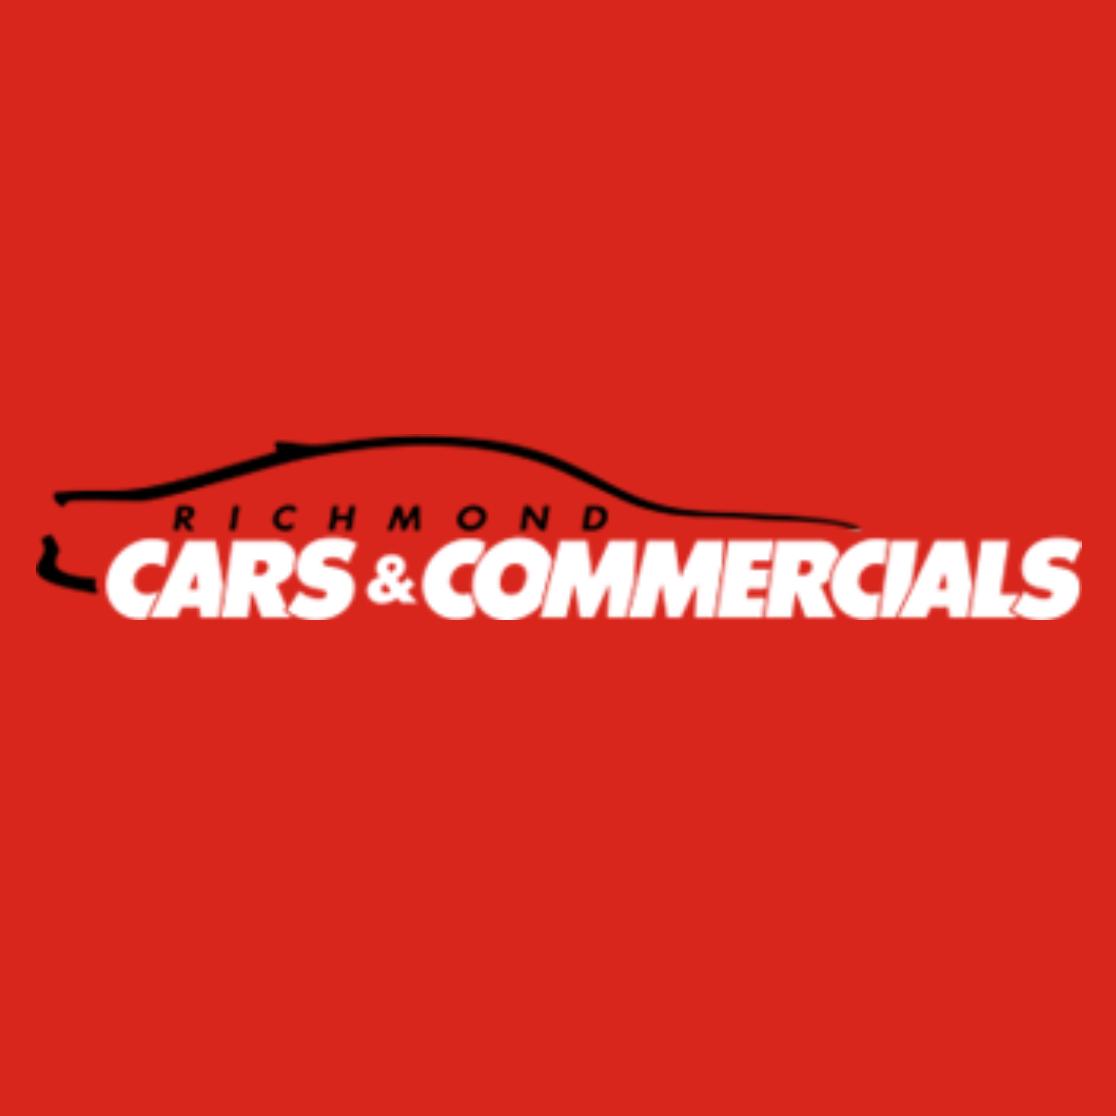 richmond cars & commercials.png